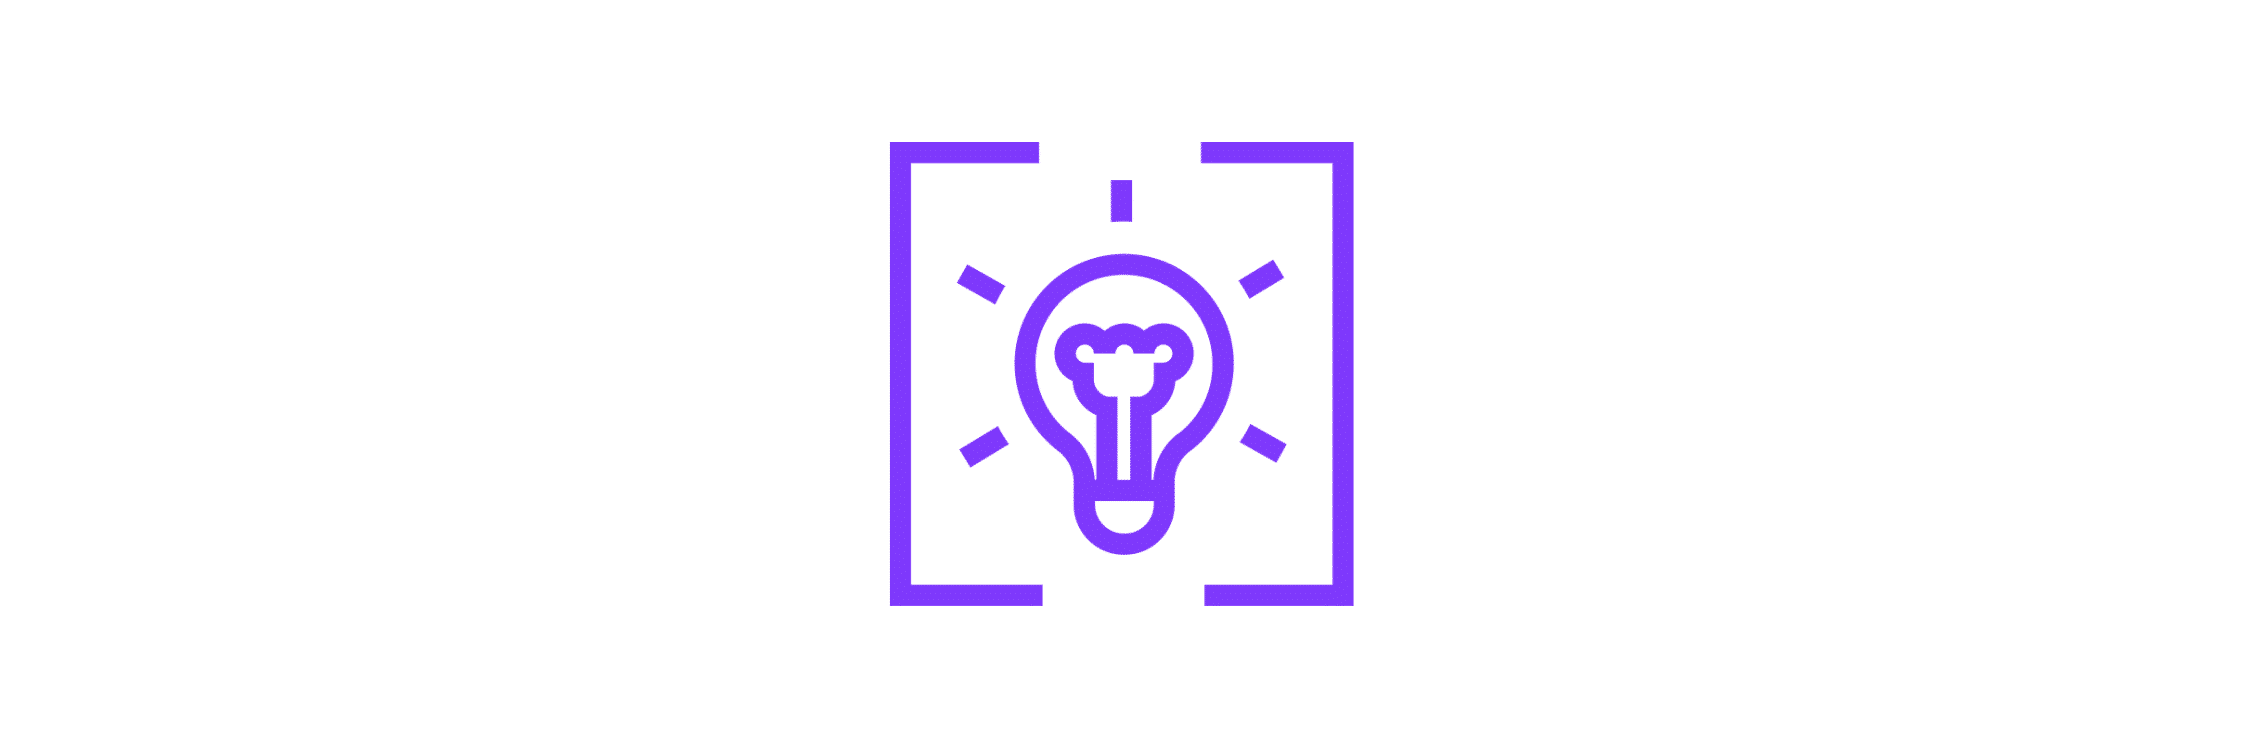 idea. mobile application development lifecycle